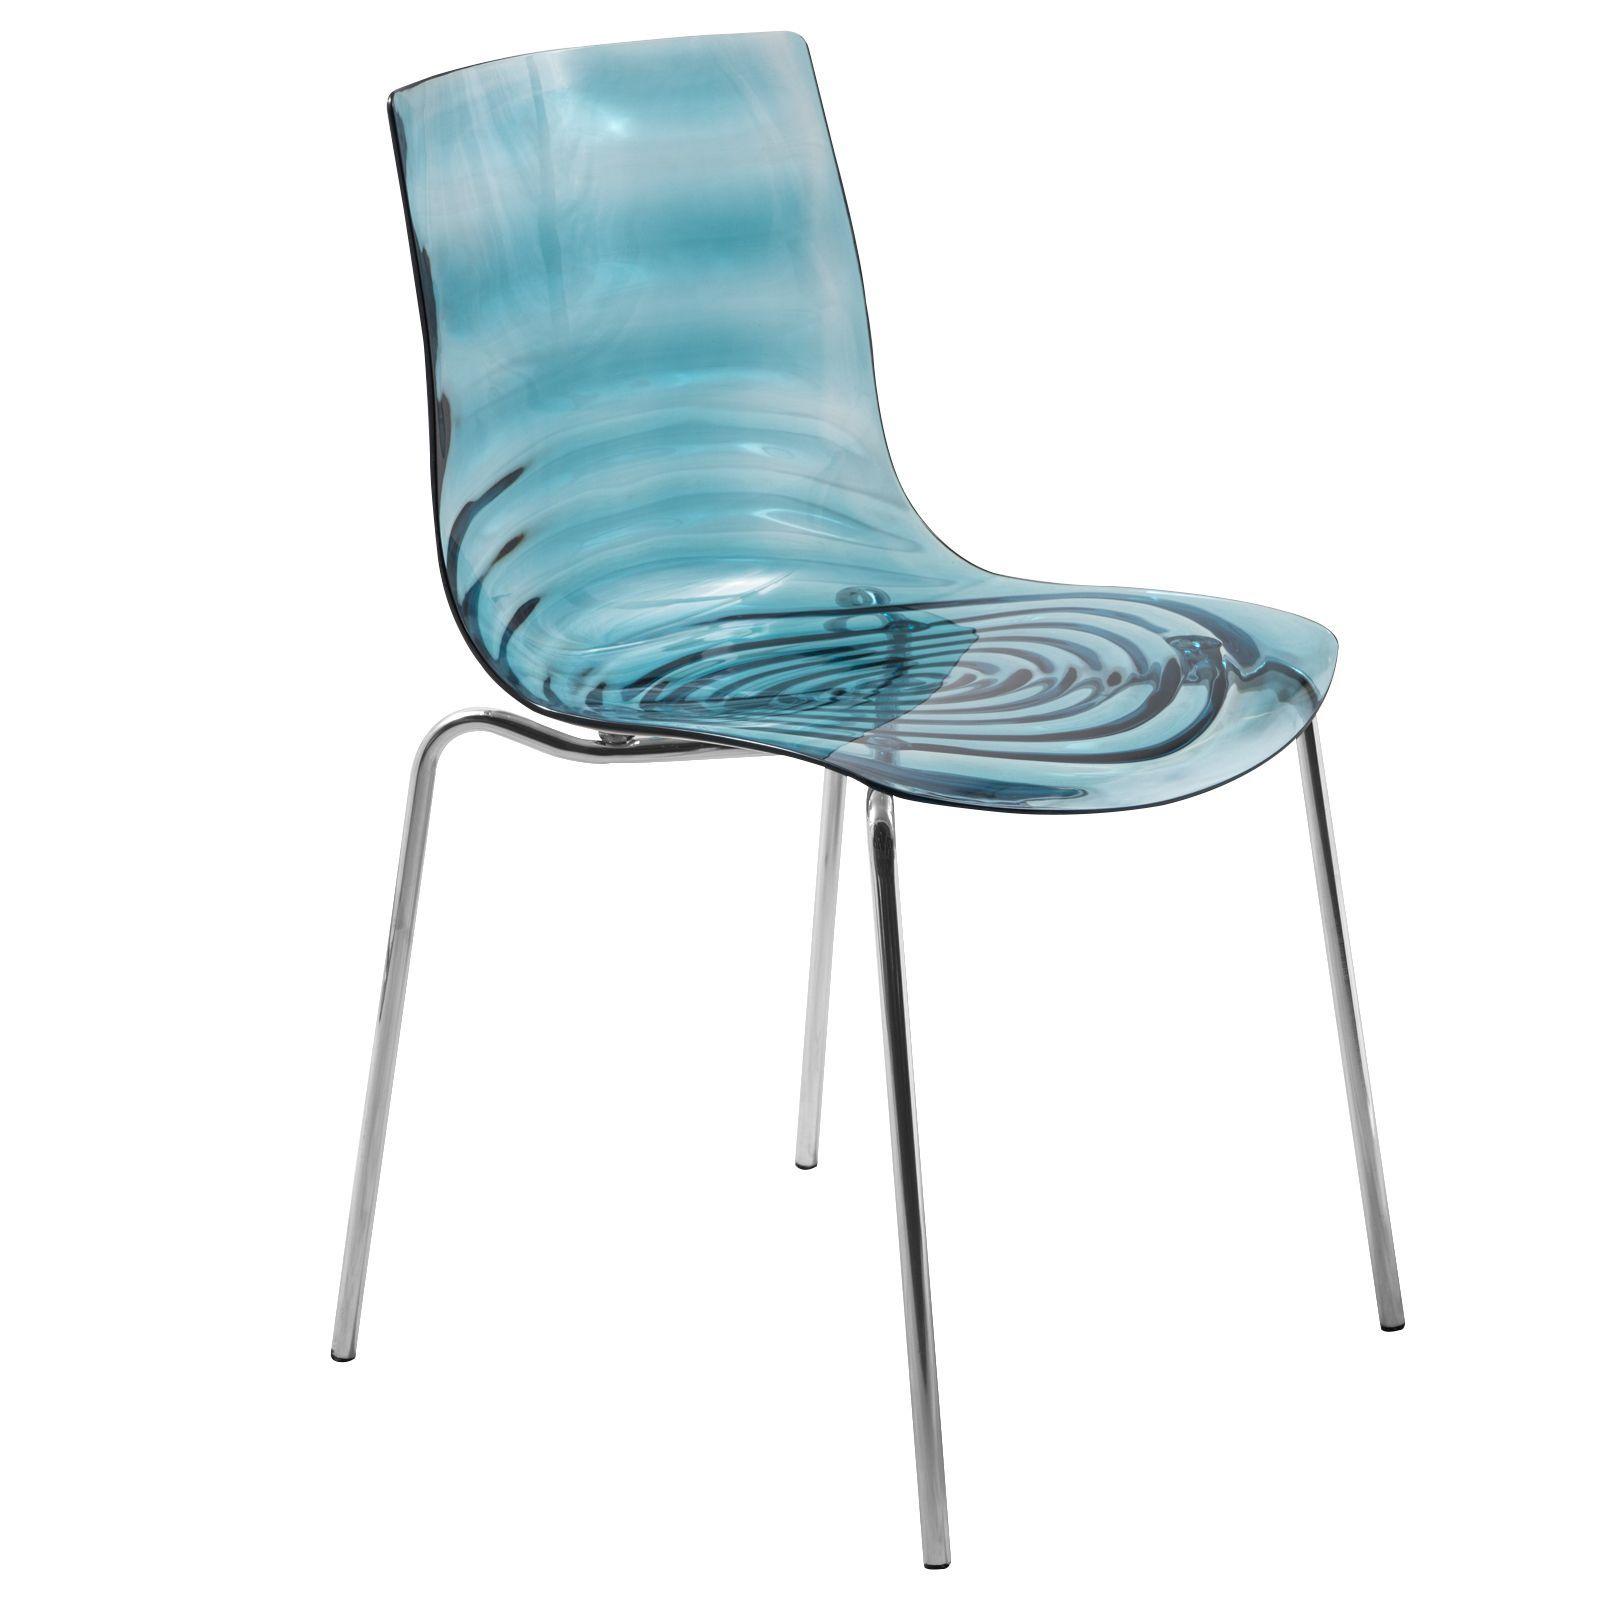 LeisureMod Astor Polycarbonate Modern Transparent Blue Dining Chair (Astor  Transparent Blue Dining Chair) (